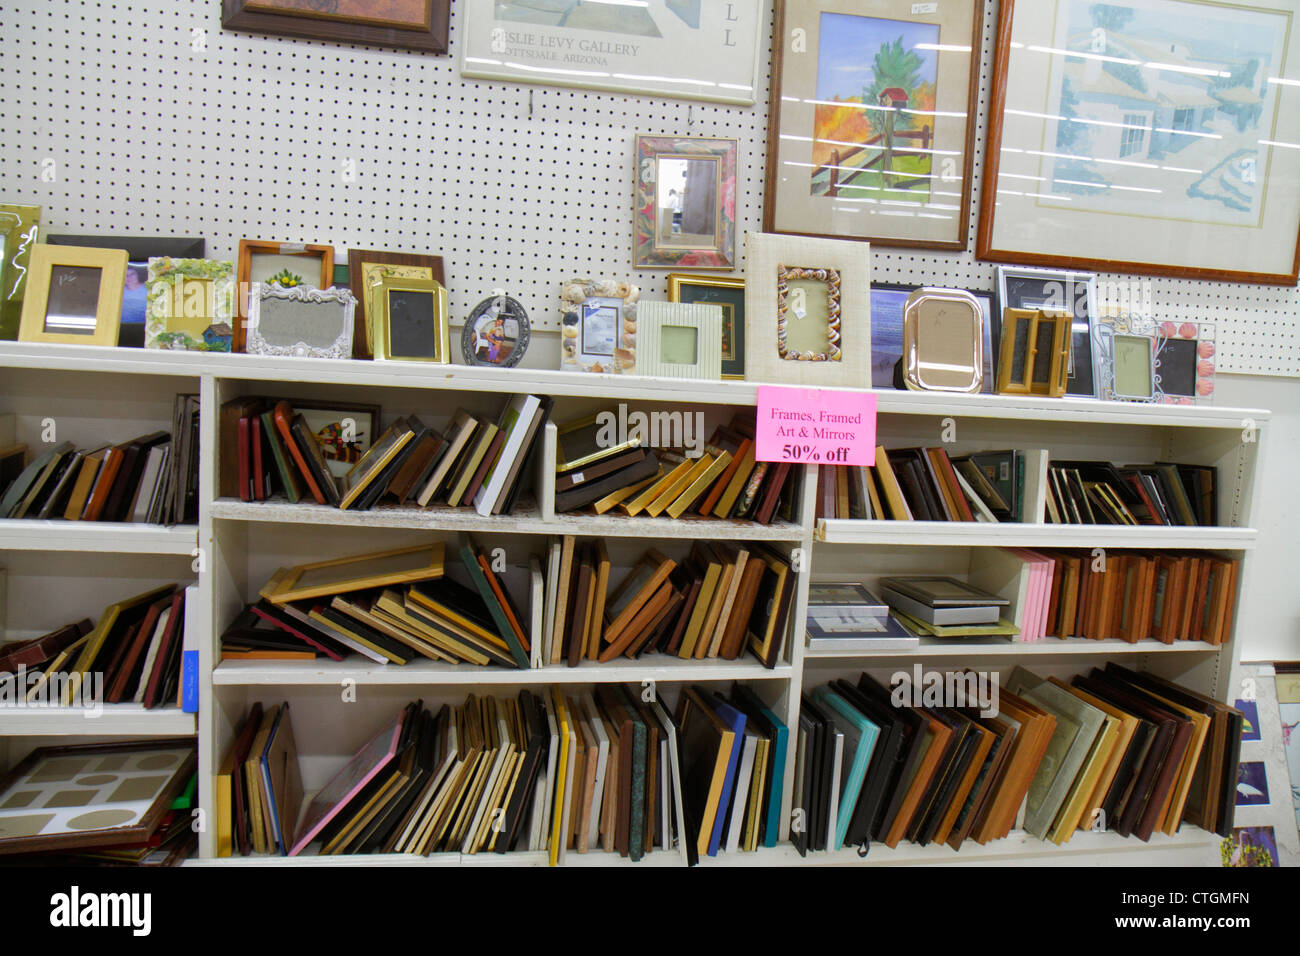 Vero Beach Florida Humane Society Thrift Shop charity interior ...